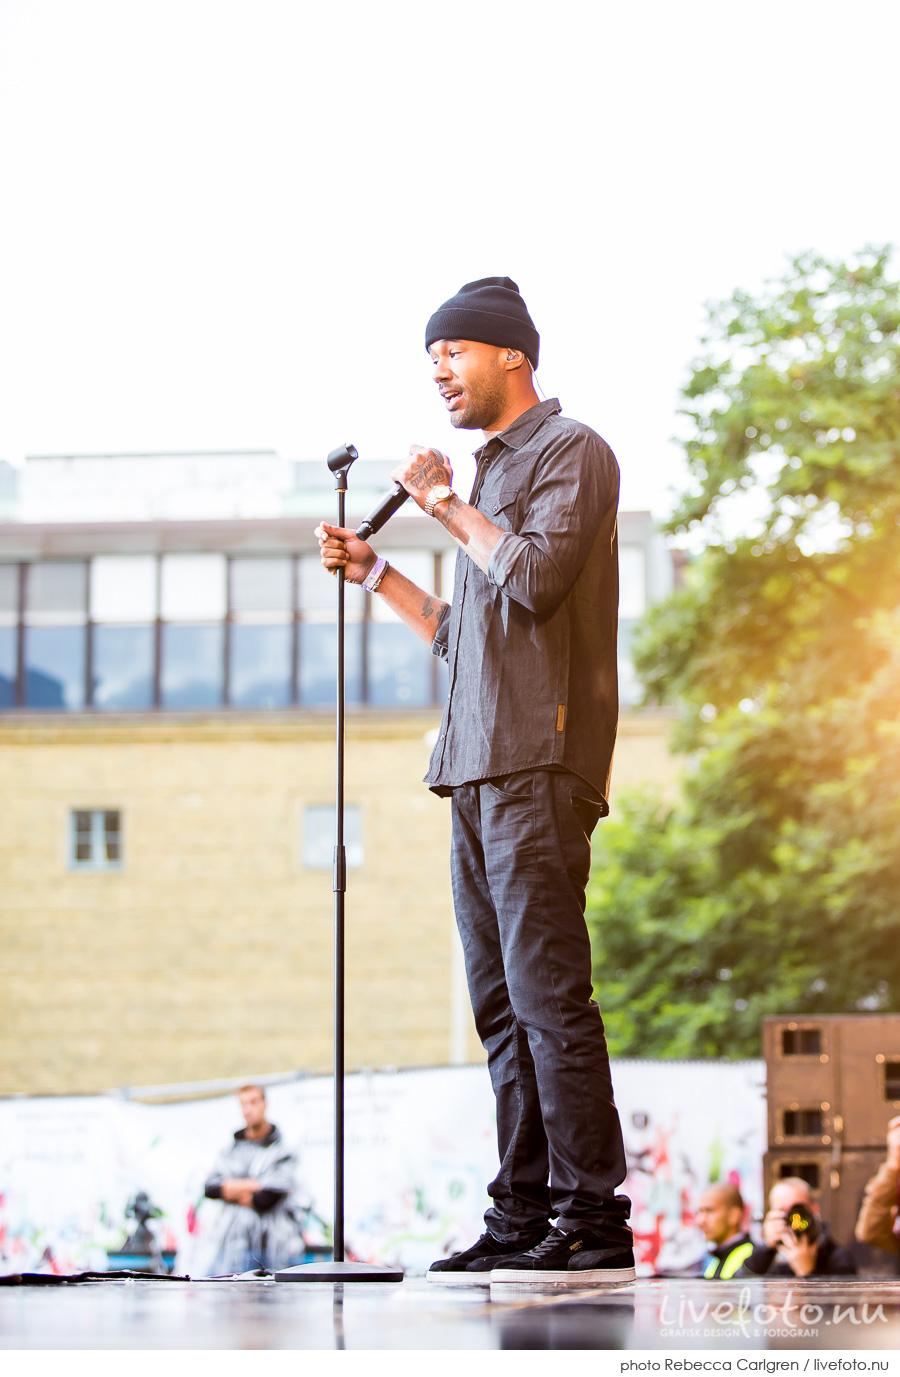 Mr. Probs på Götaplatsen, RIX FM-festival